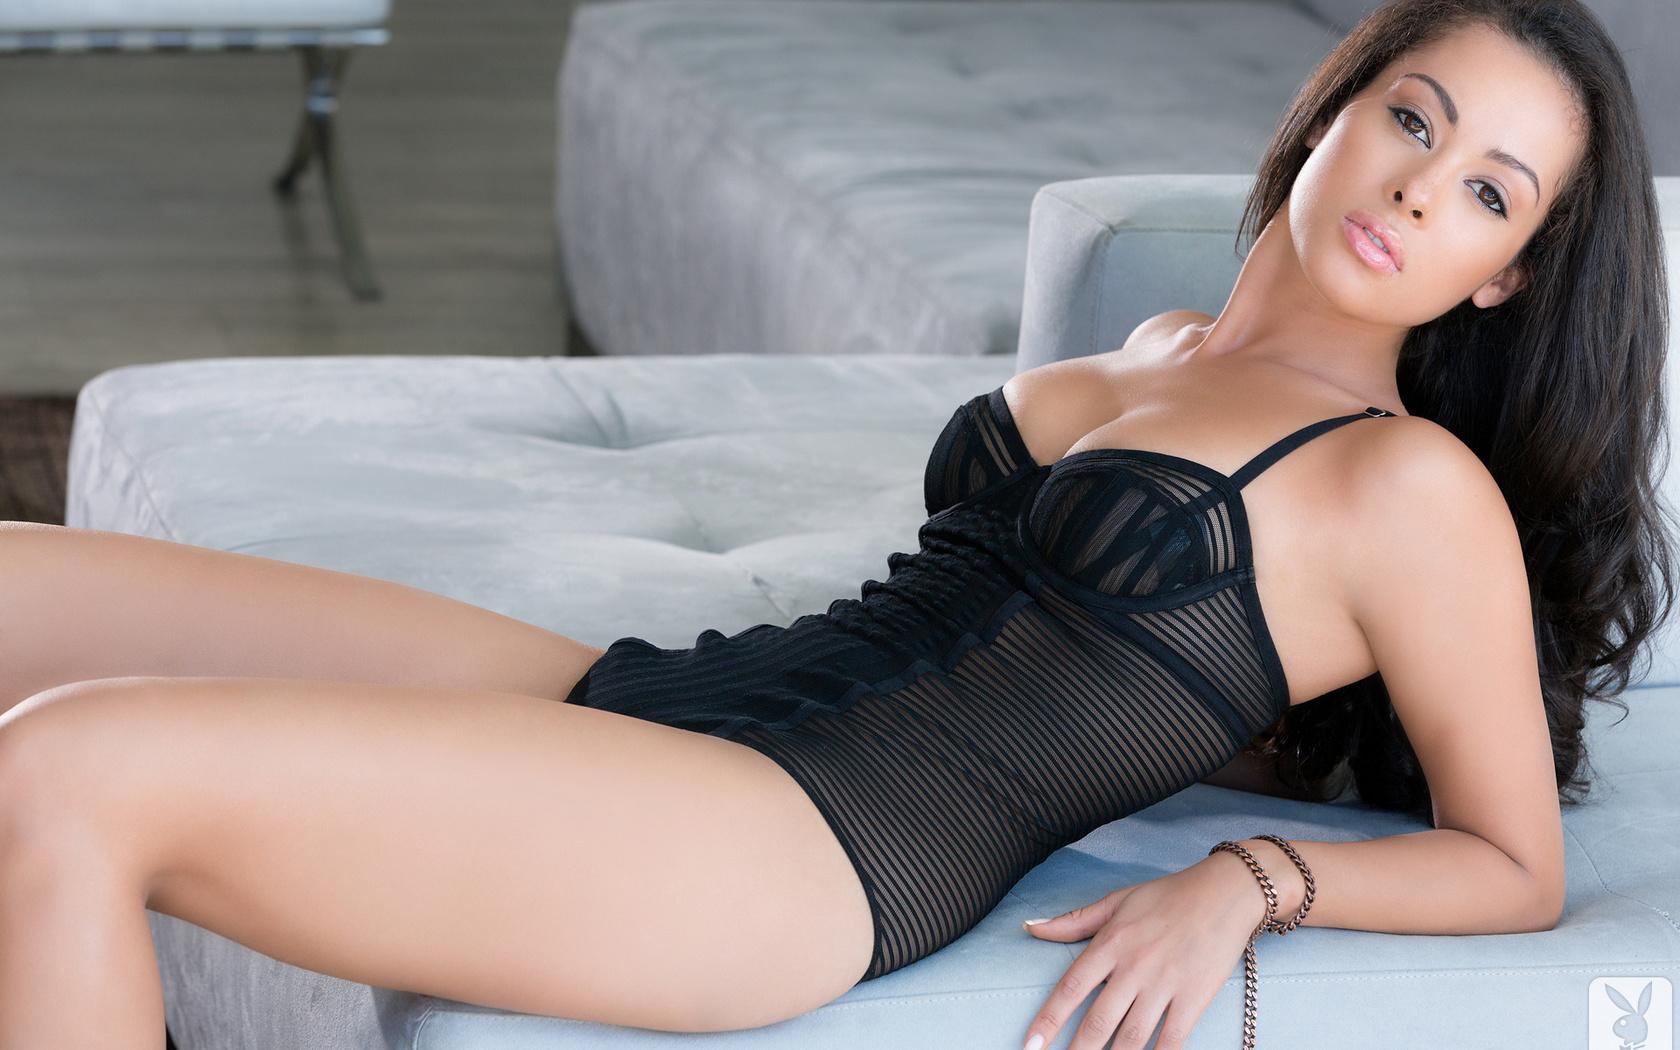 ashley doris, brunette, sexy, sofa, look, black swimsuit